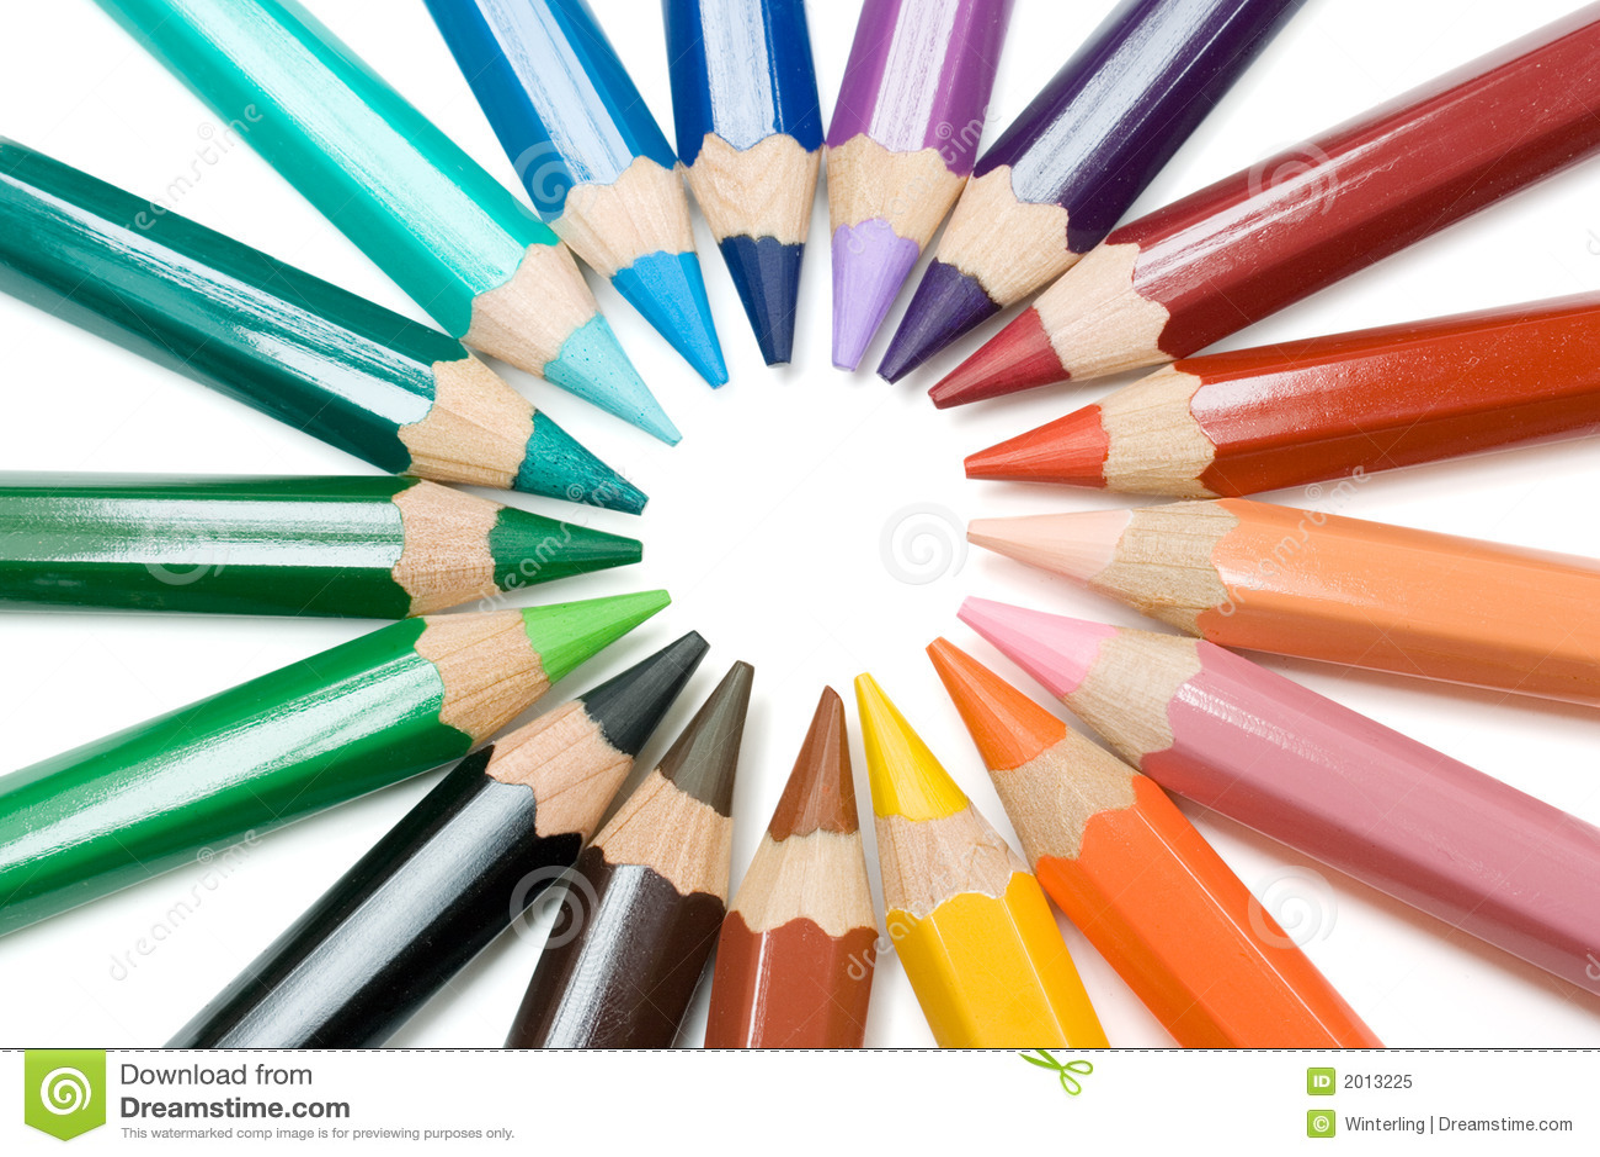 Circle Of Crayons Stock Image Image Of Crayons Coloring